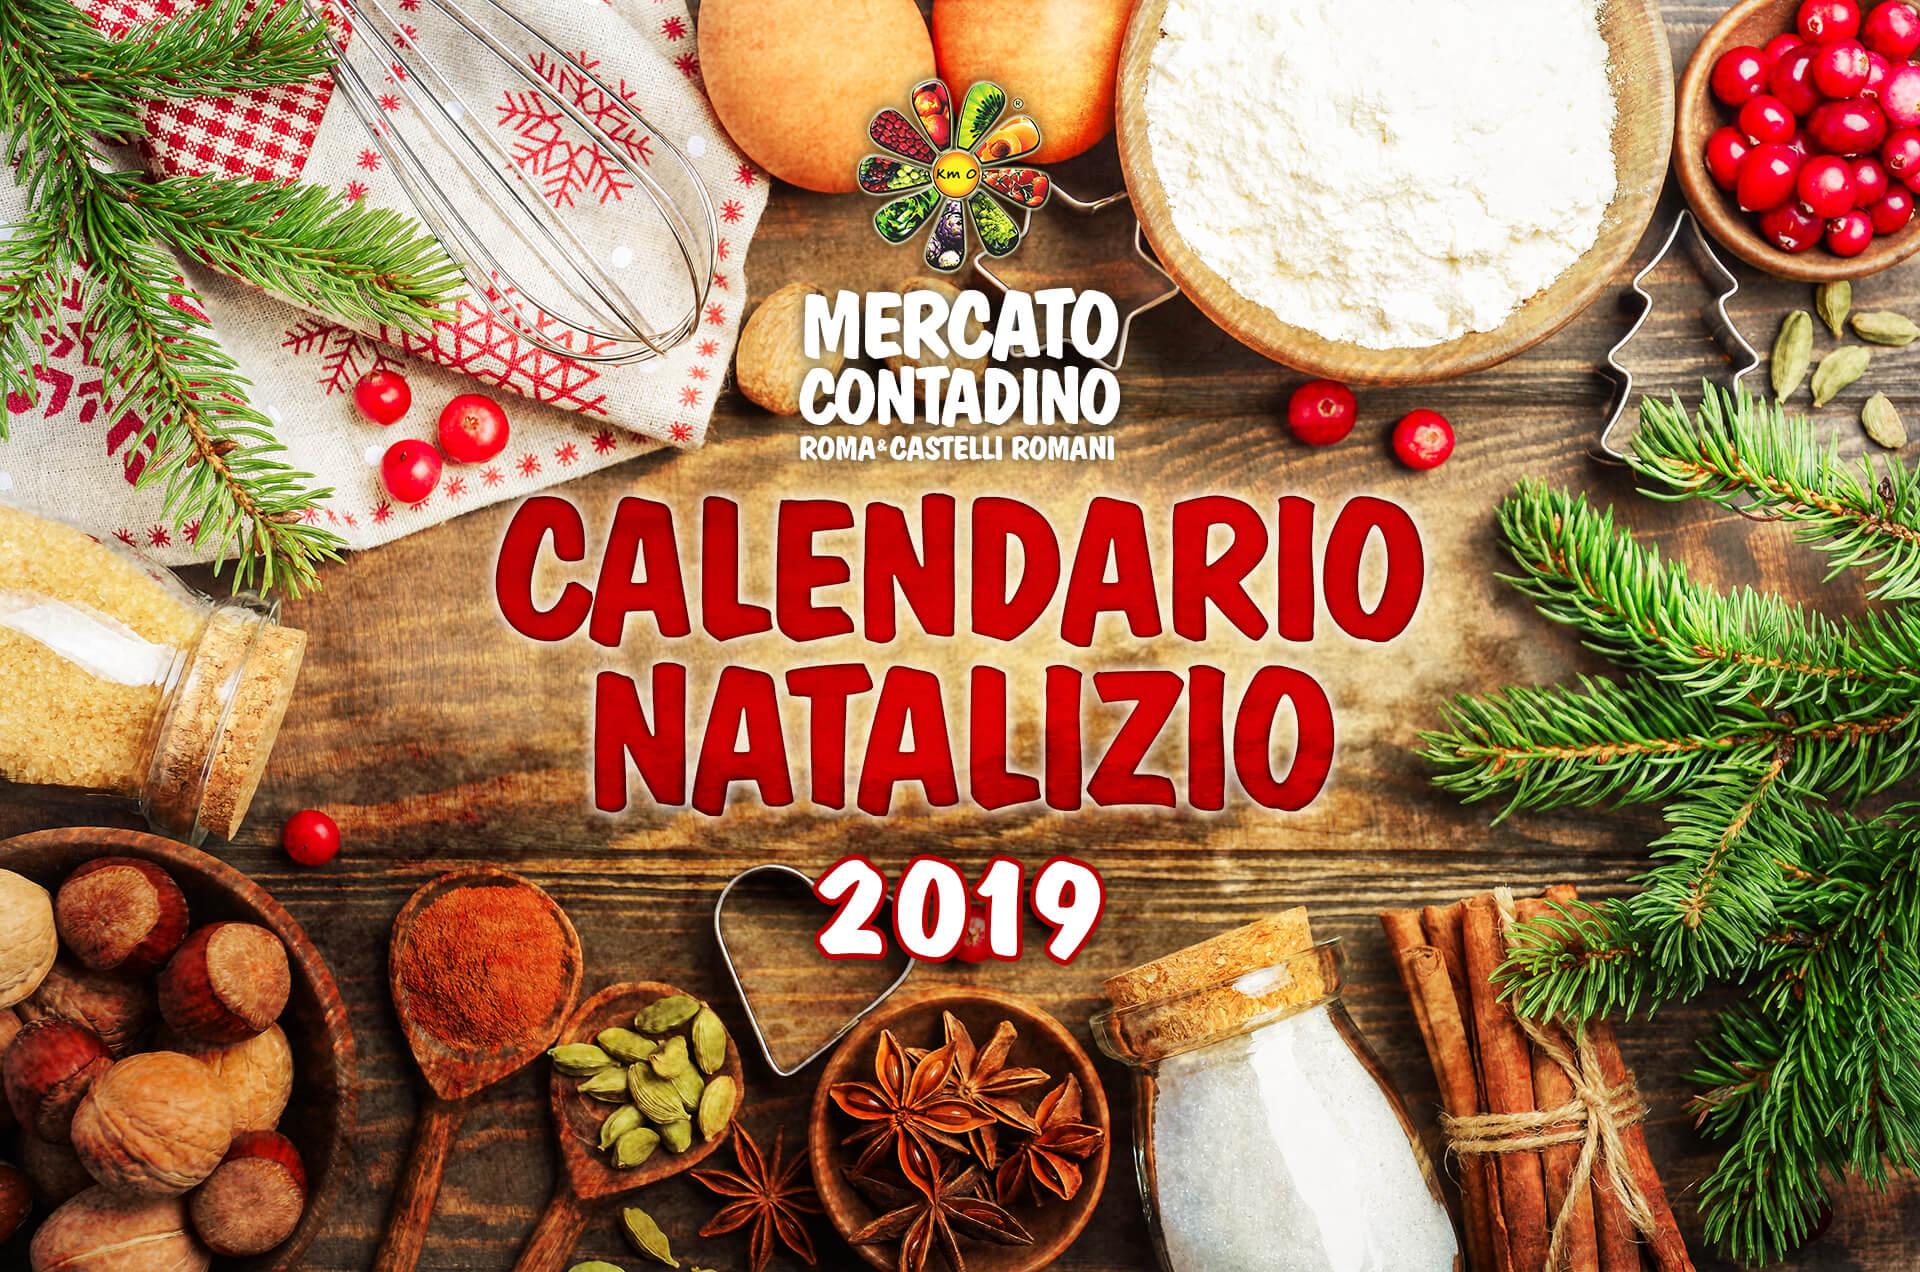 mercato contadino calendario natale